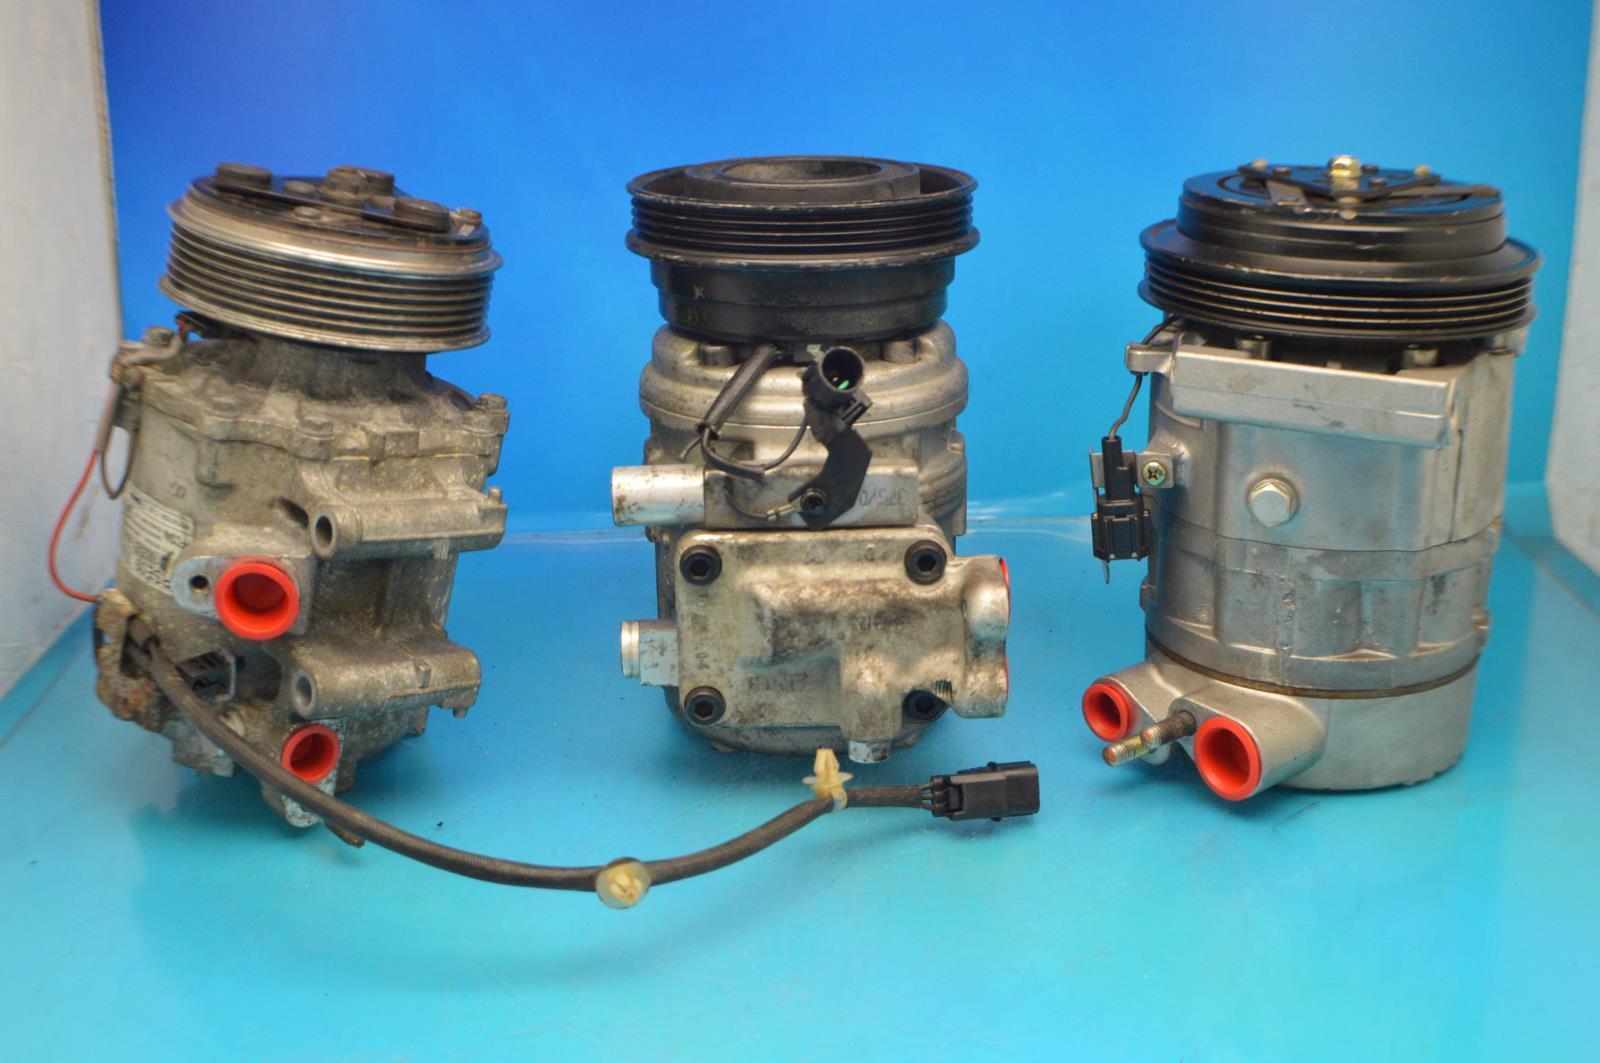 NEW A//C Compressor for 1993-1997 Toyota Landcruiser 1996-1997 LX450 4.5L Each